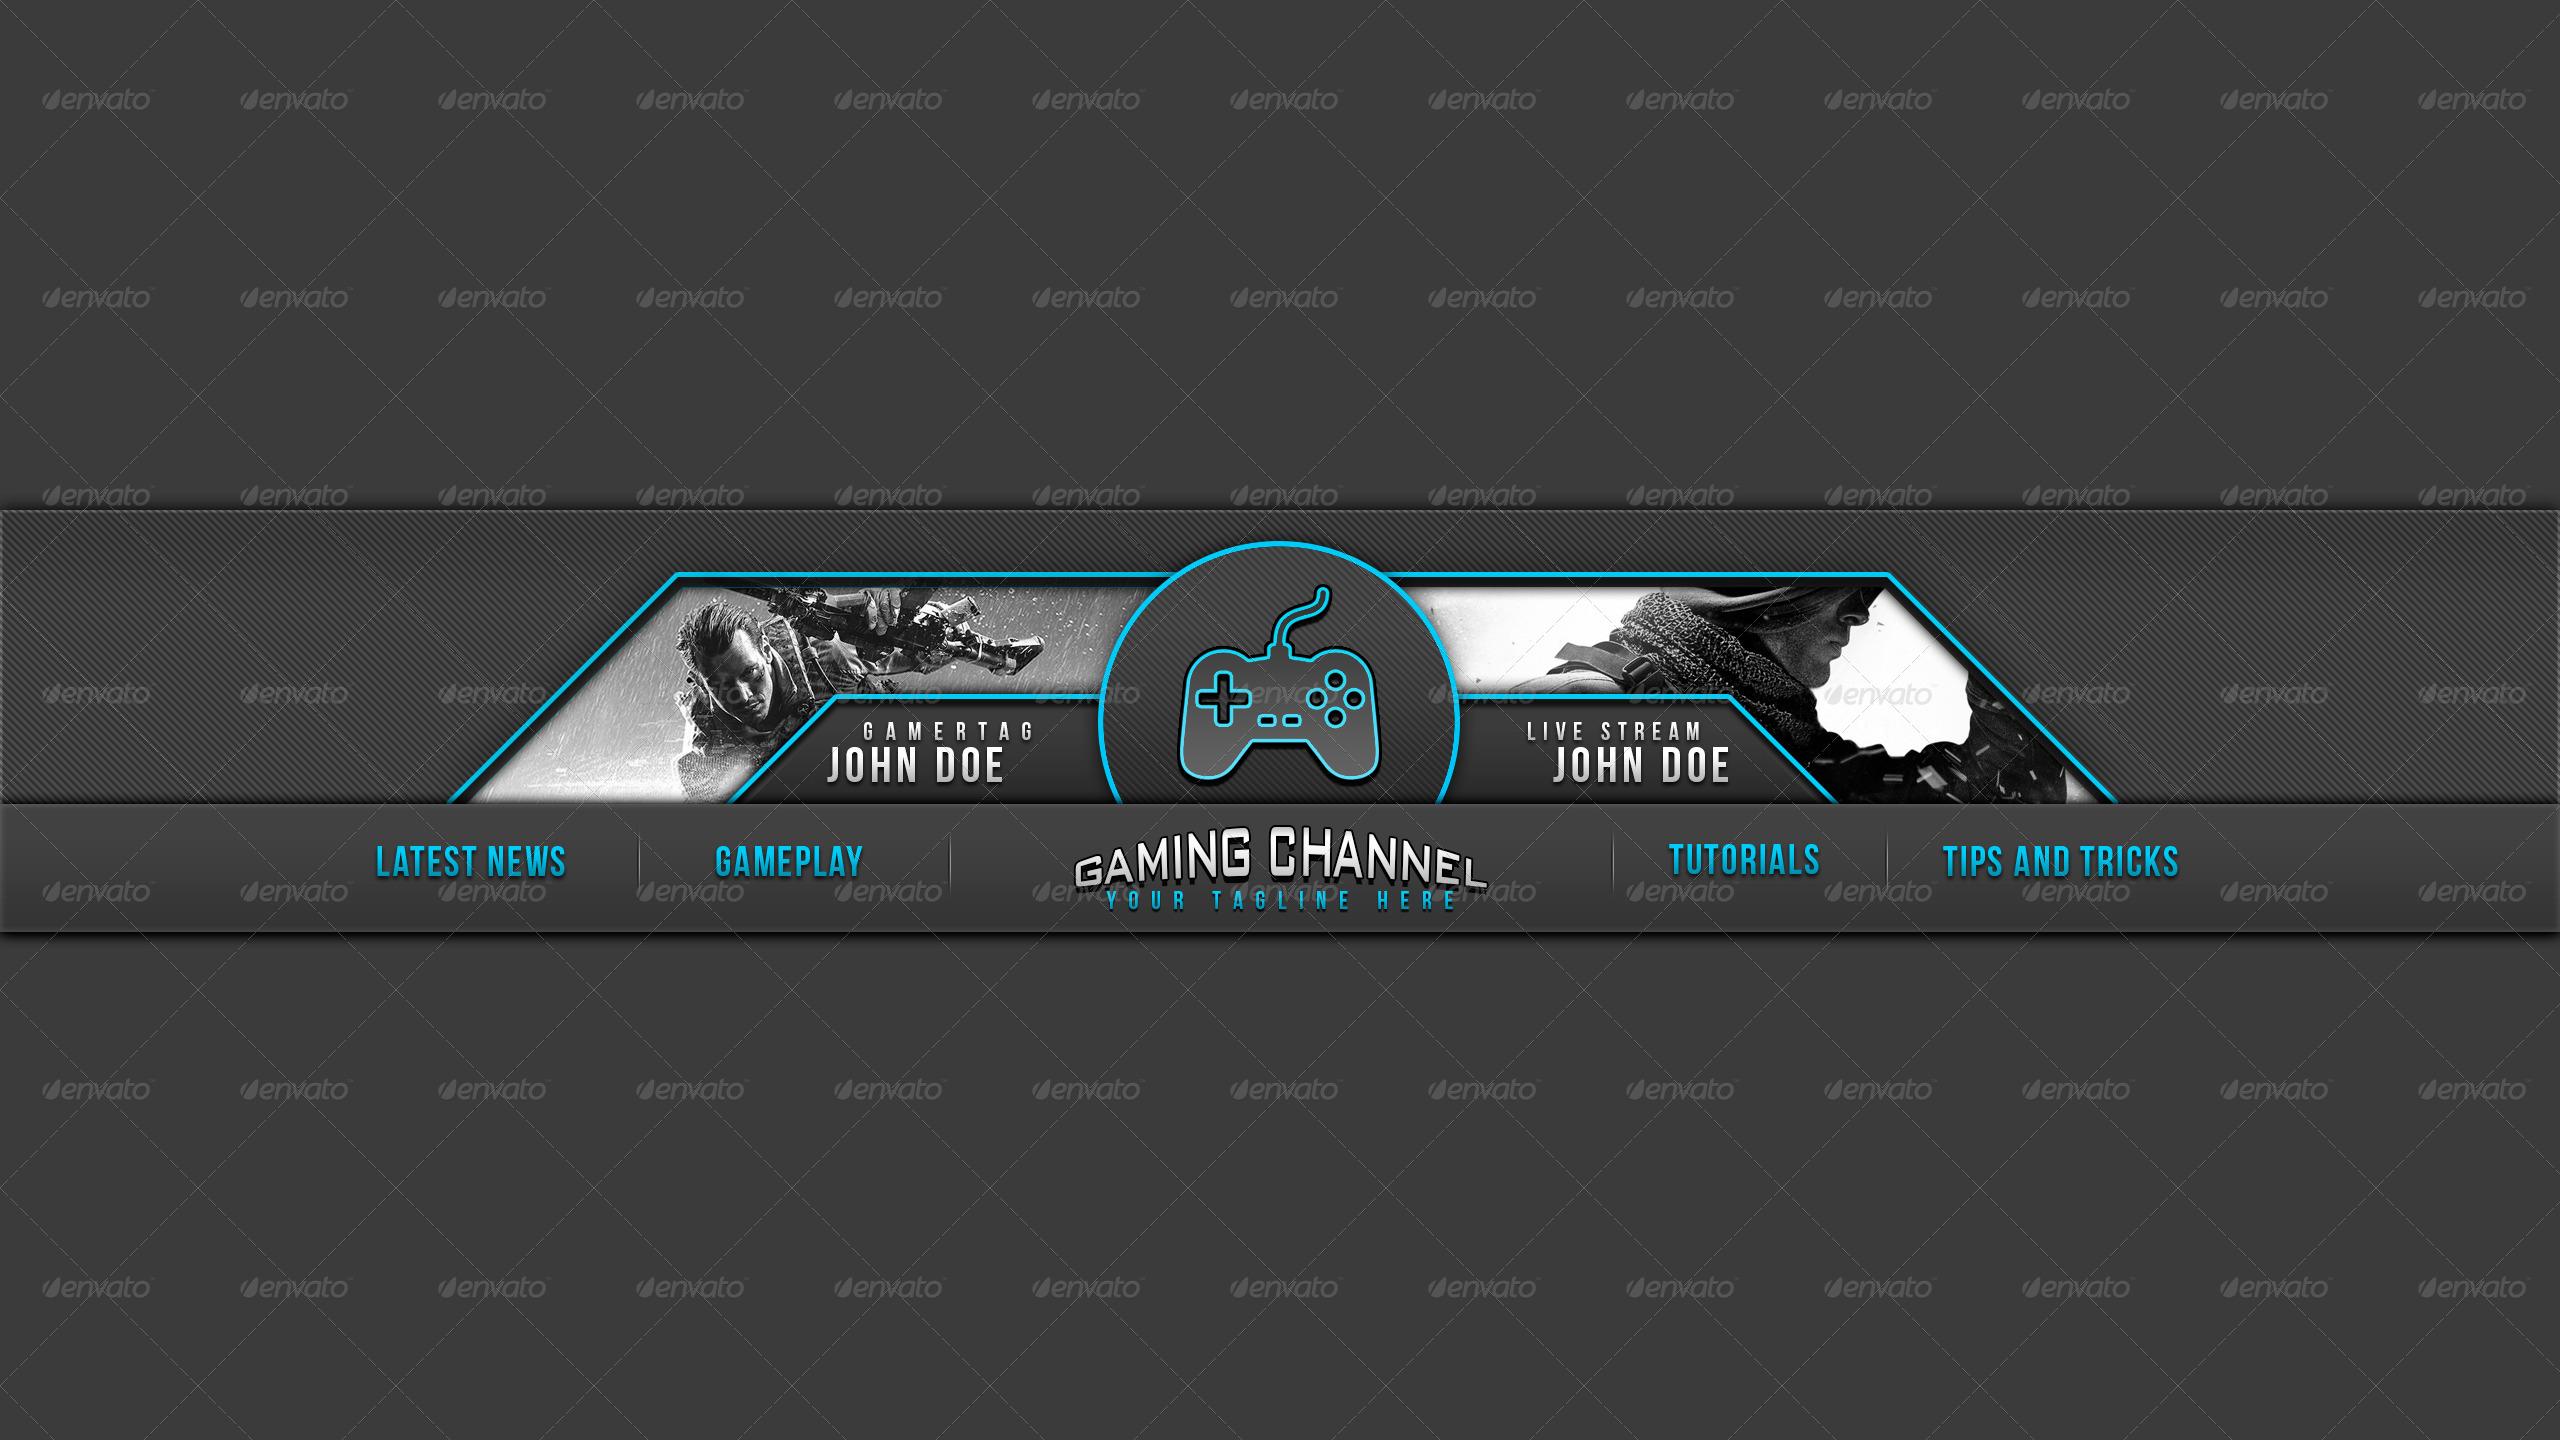 Banner Youtube Gaming Polos 2560x1440 Download Hd Wallpaper Wallpapertip